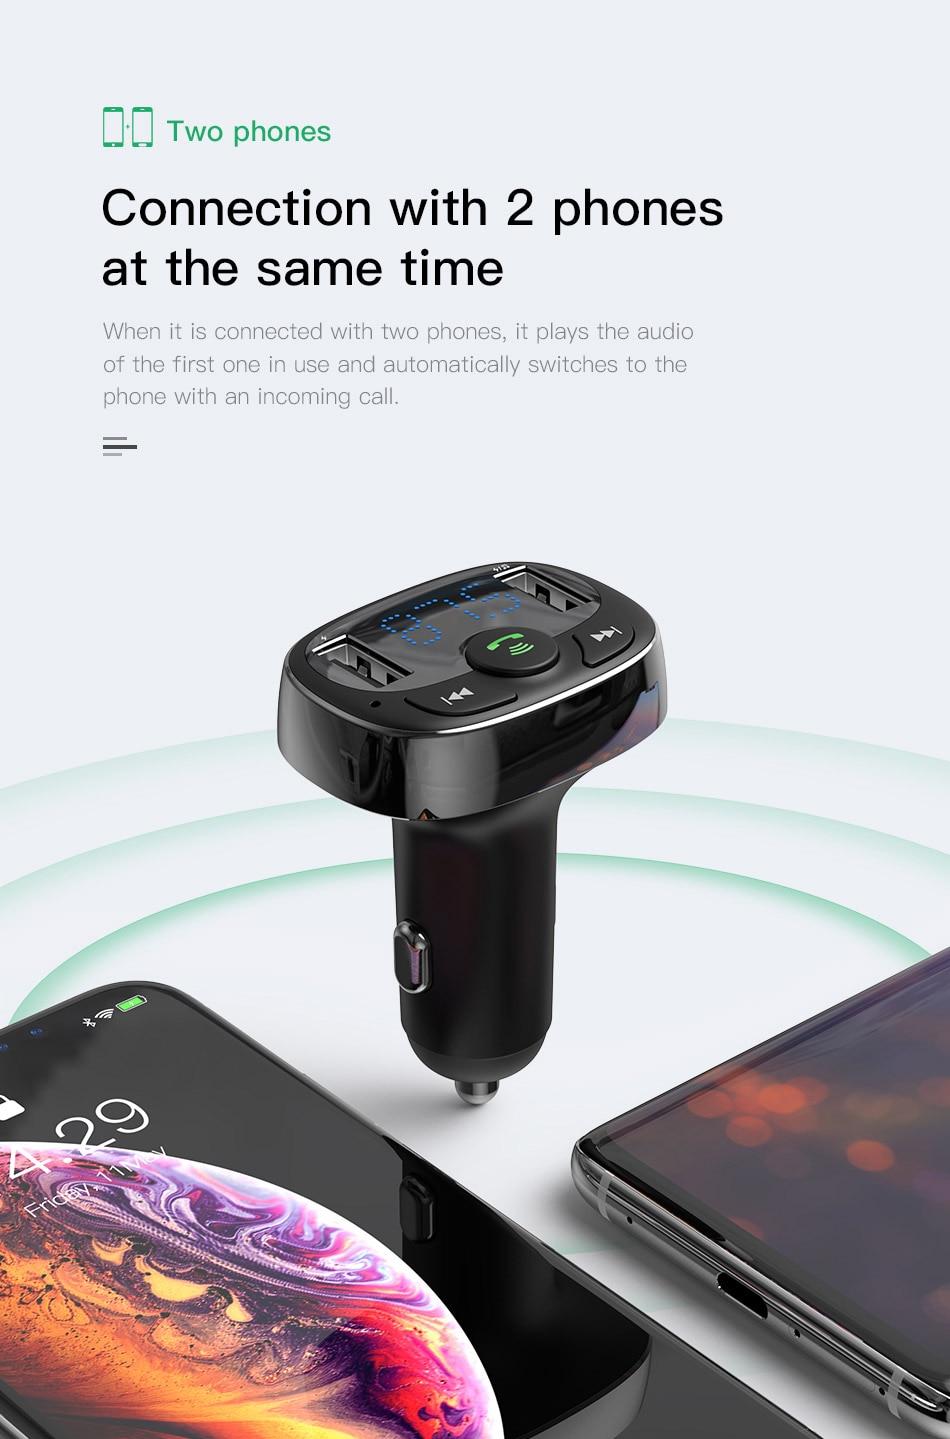 HTB1.29raUrrK1RkSne1q6ArVVXaD - Car Charger for Mobile Phone FM Transmitter Bluetooth MP3 Player